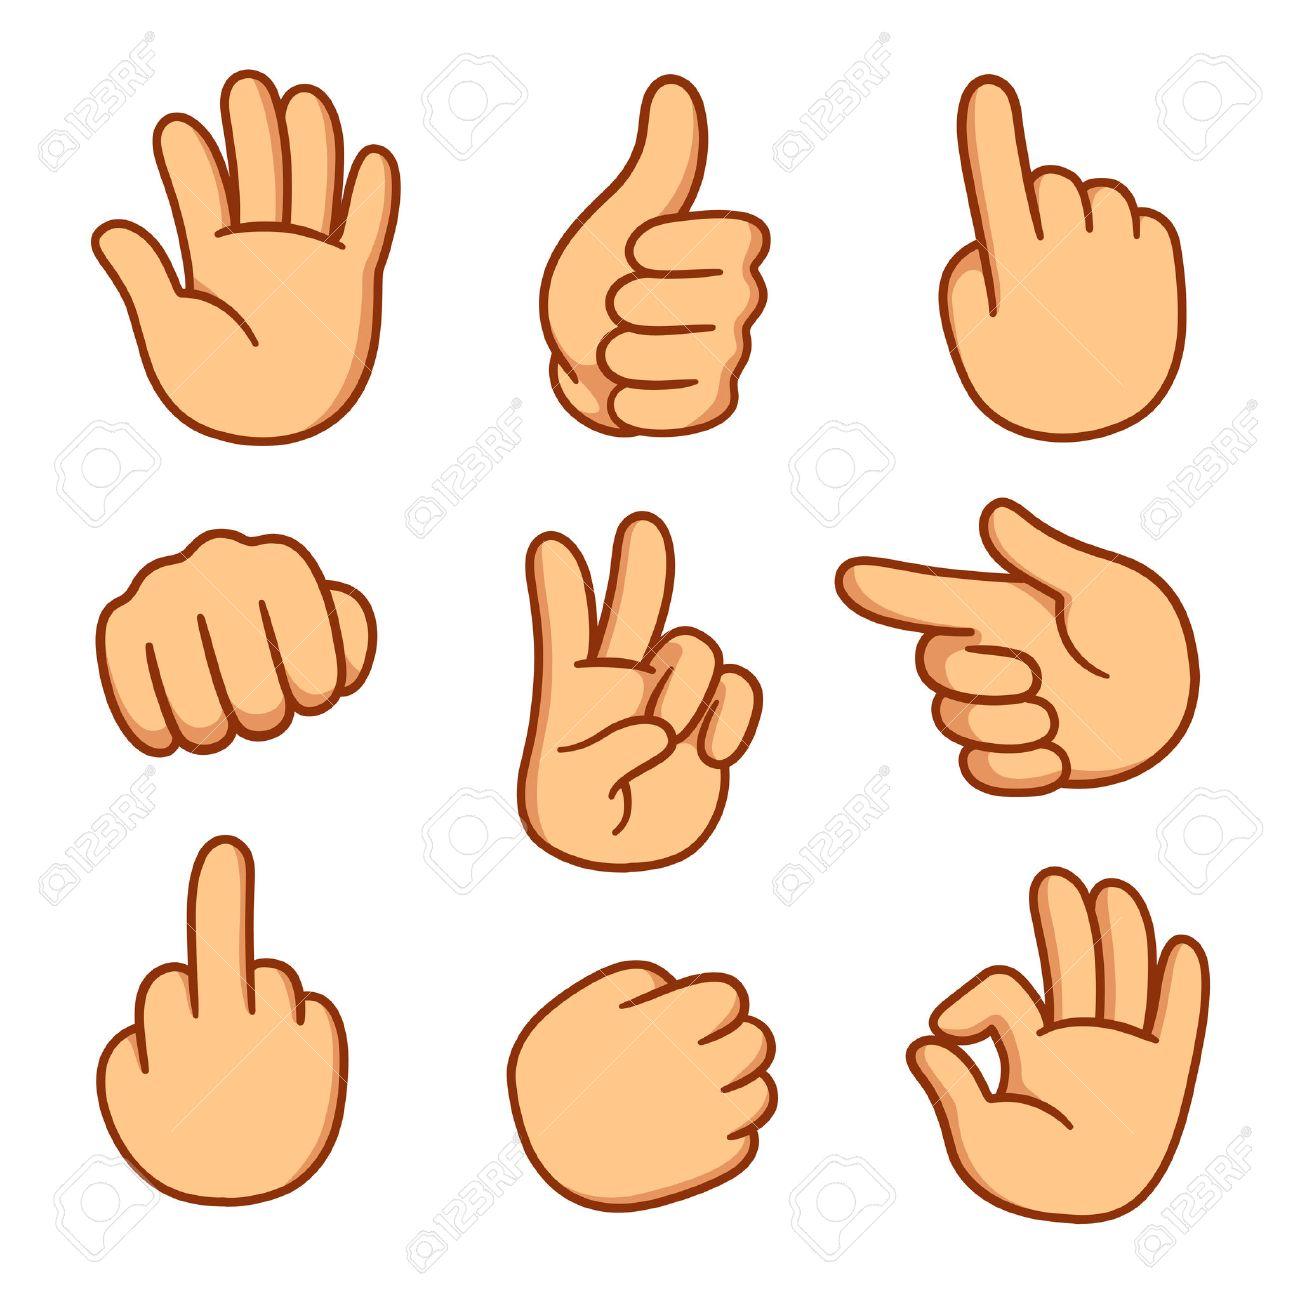 Cartoon hands set. Different gestures vector illustration. - 56736509